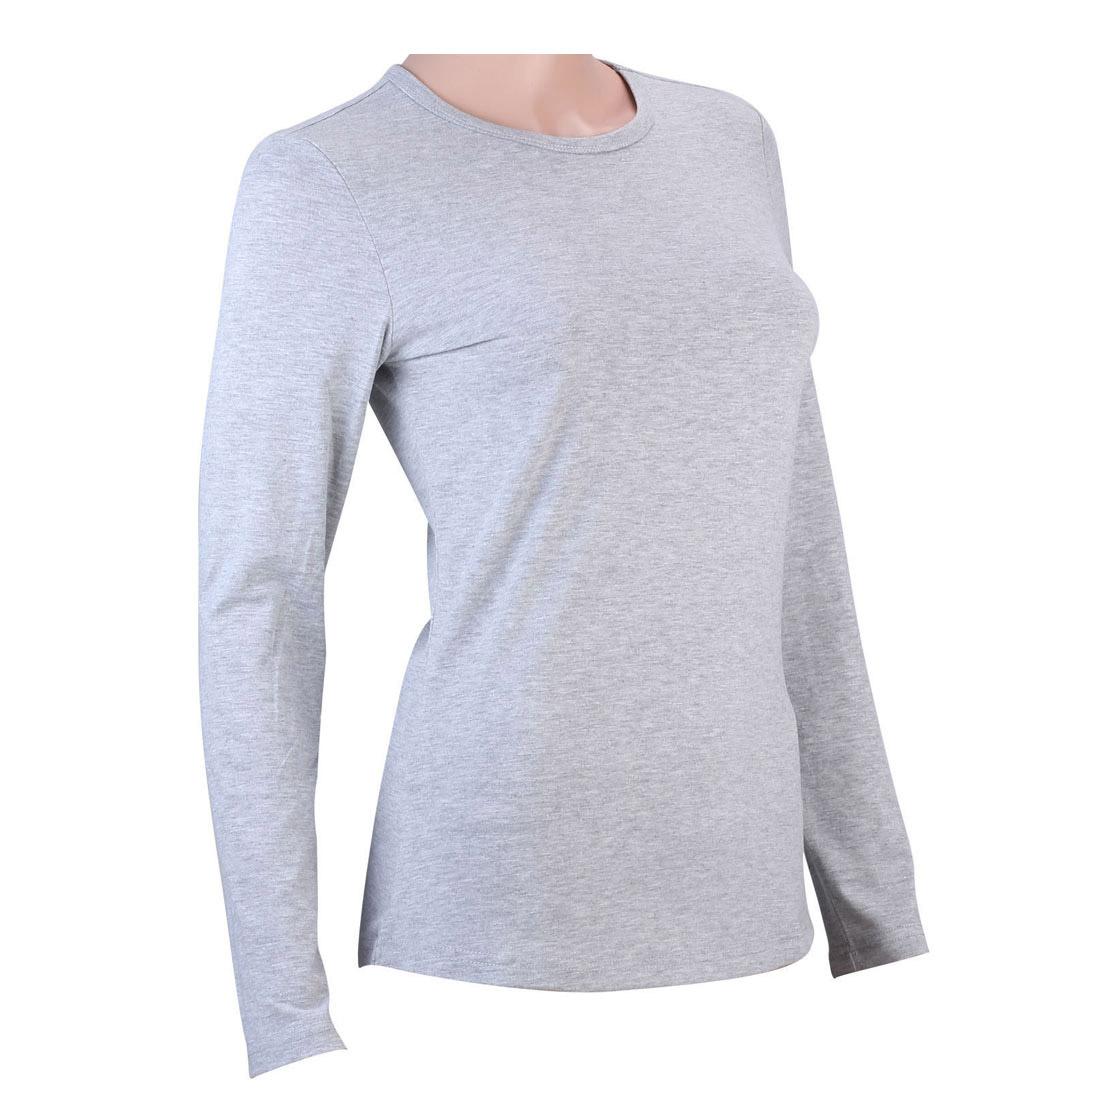 100 cotton womens basic tee long sleeve t shirt plain for Long sleeve womens t shirts